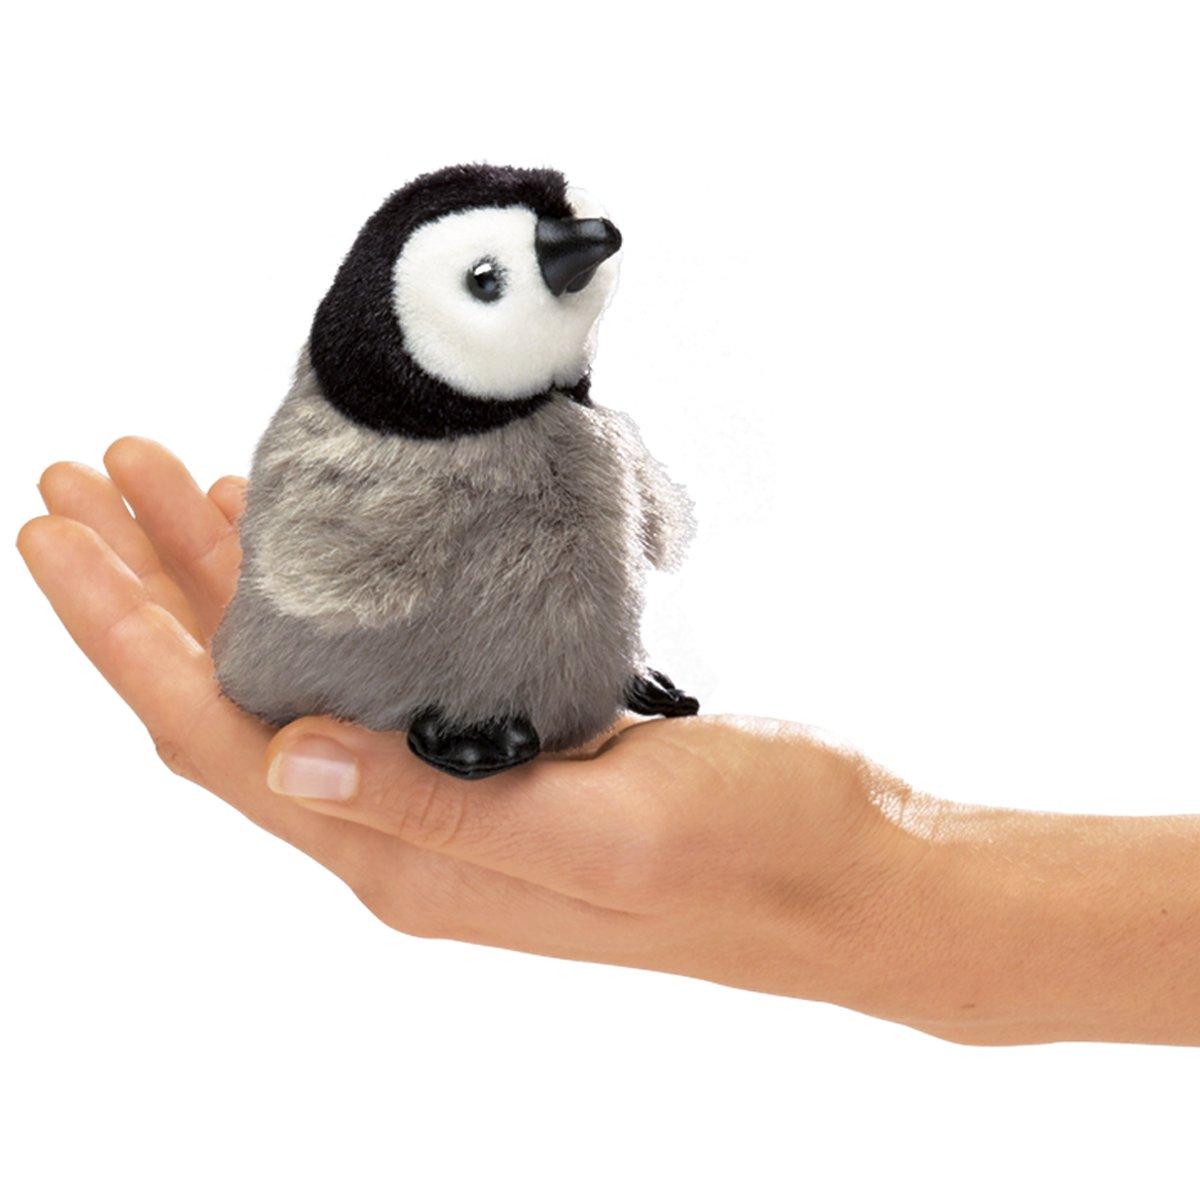 Folkmanis Mini Emperor Penguin Baby Finger Puppet Folkmanis Puppets 2680